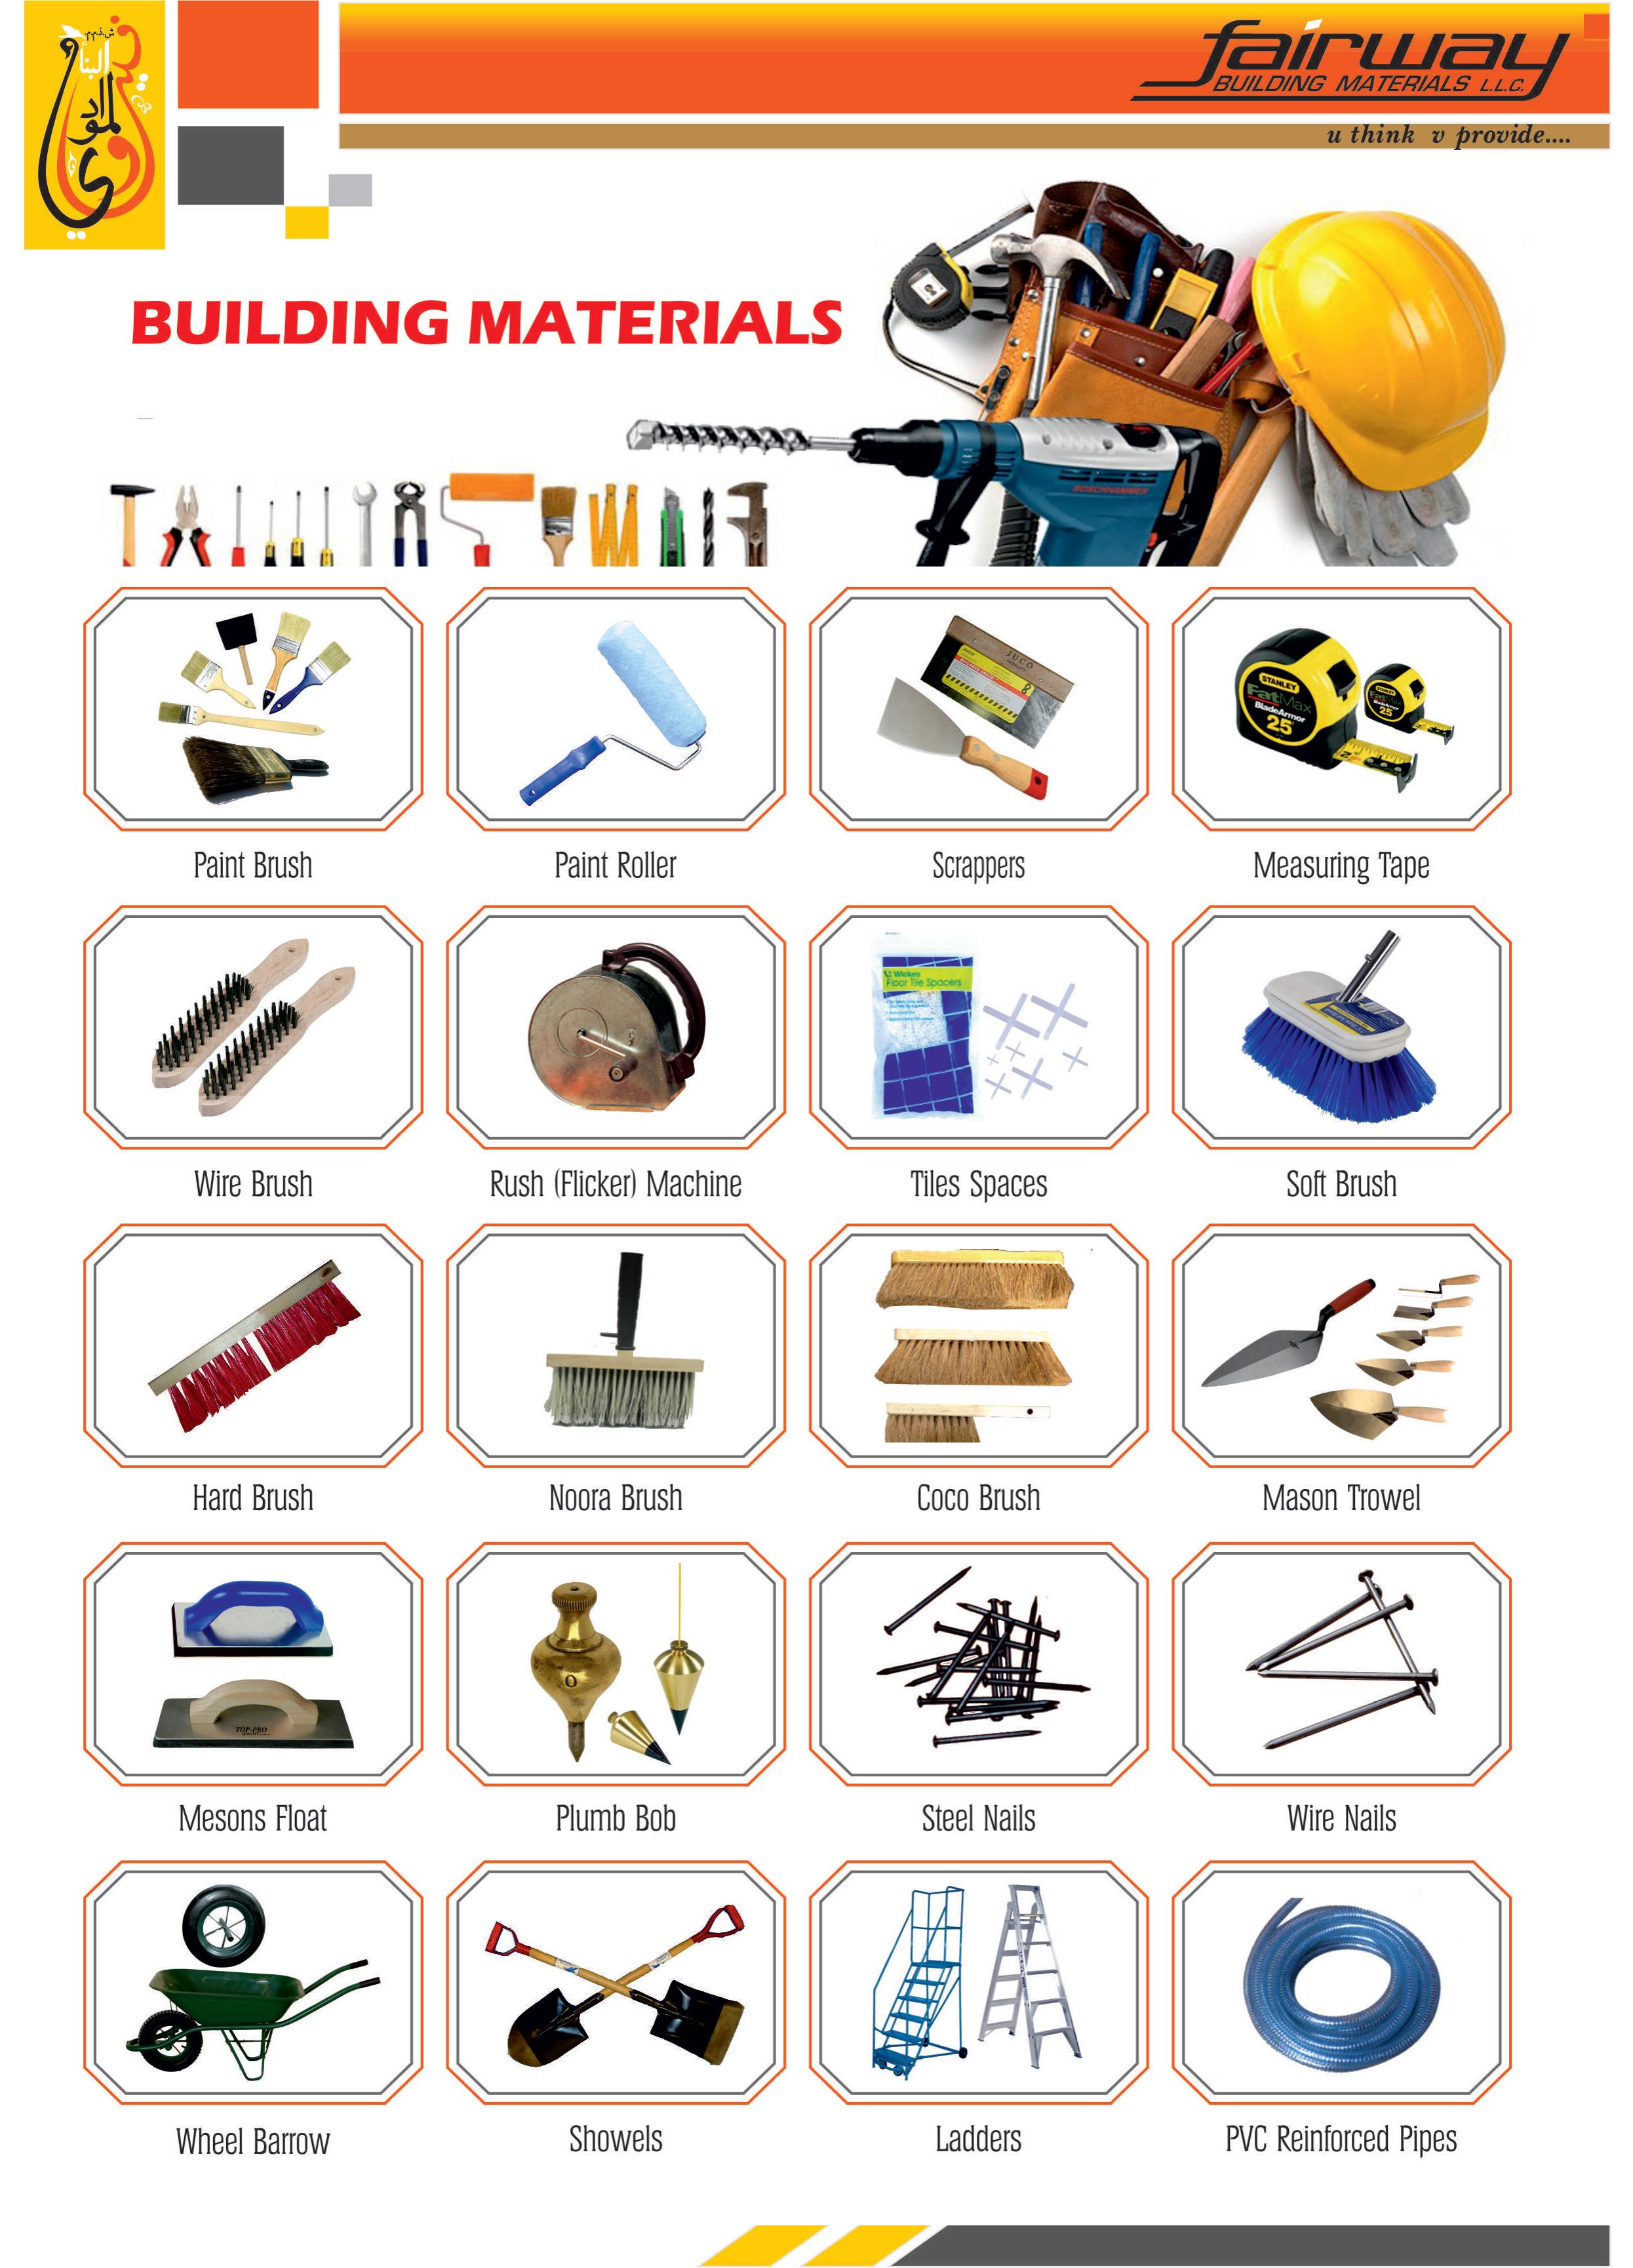 Building Materials Product : Building materials fairway